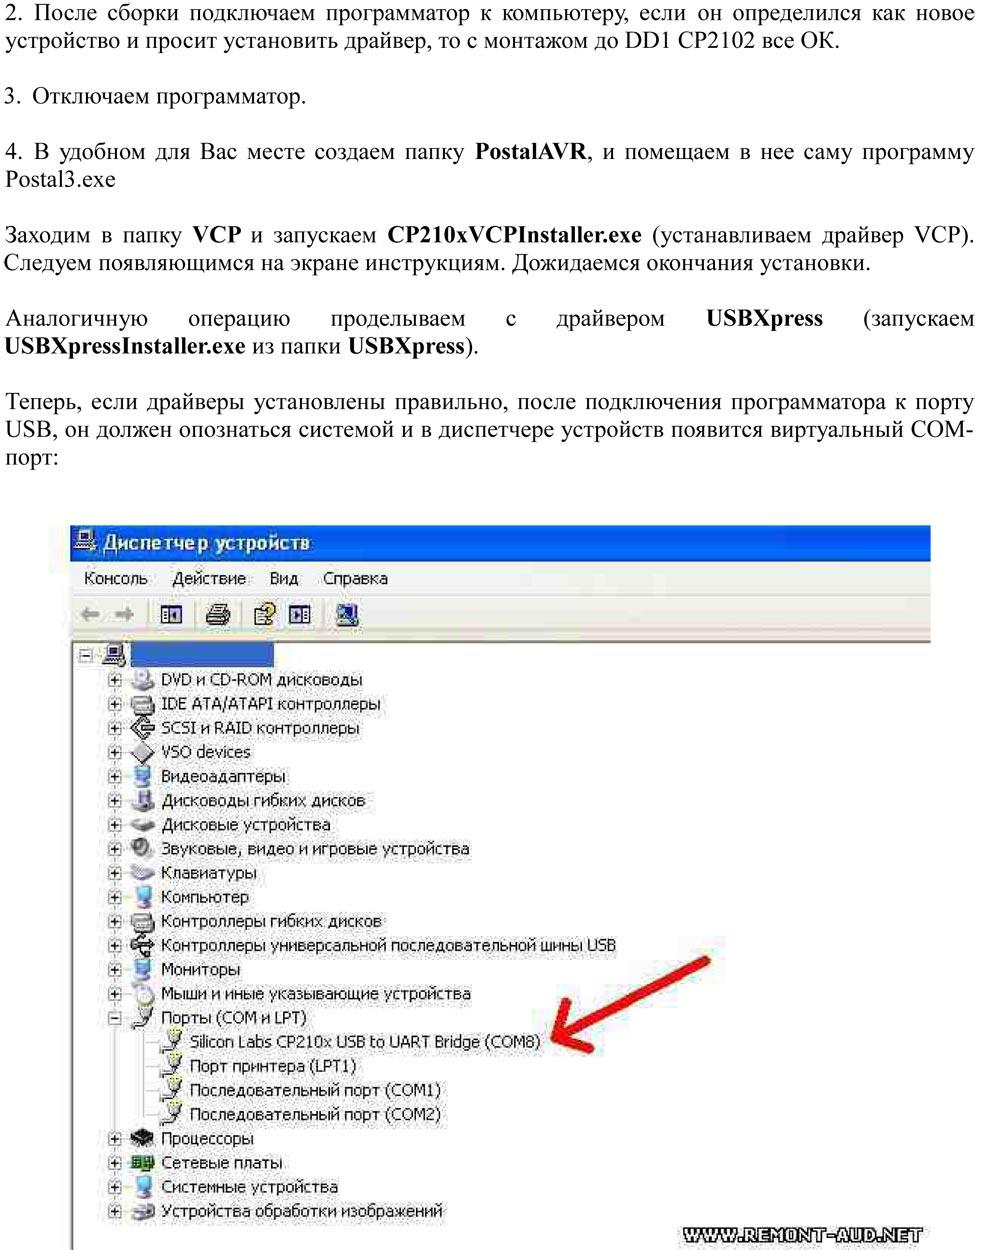 Инструкция по сборке и настройке программатора Postal3 - FULL в корпусе. Страница 2